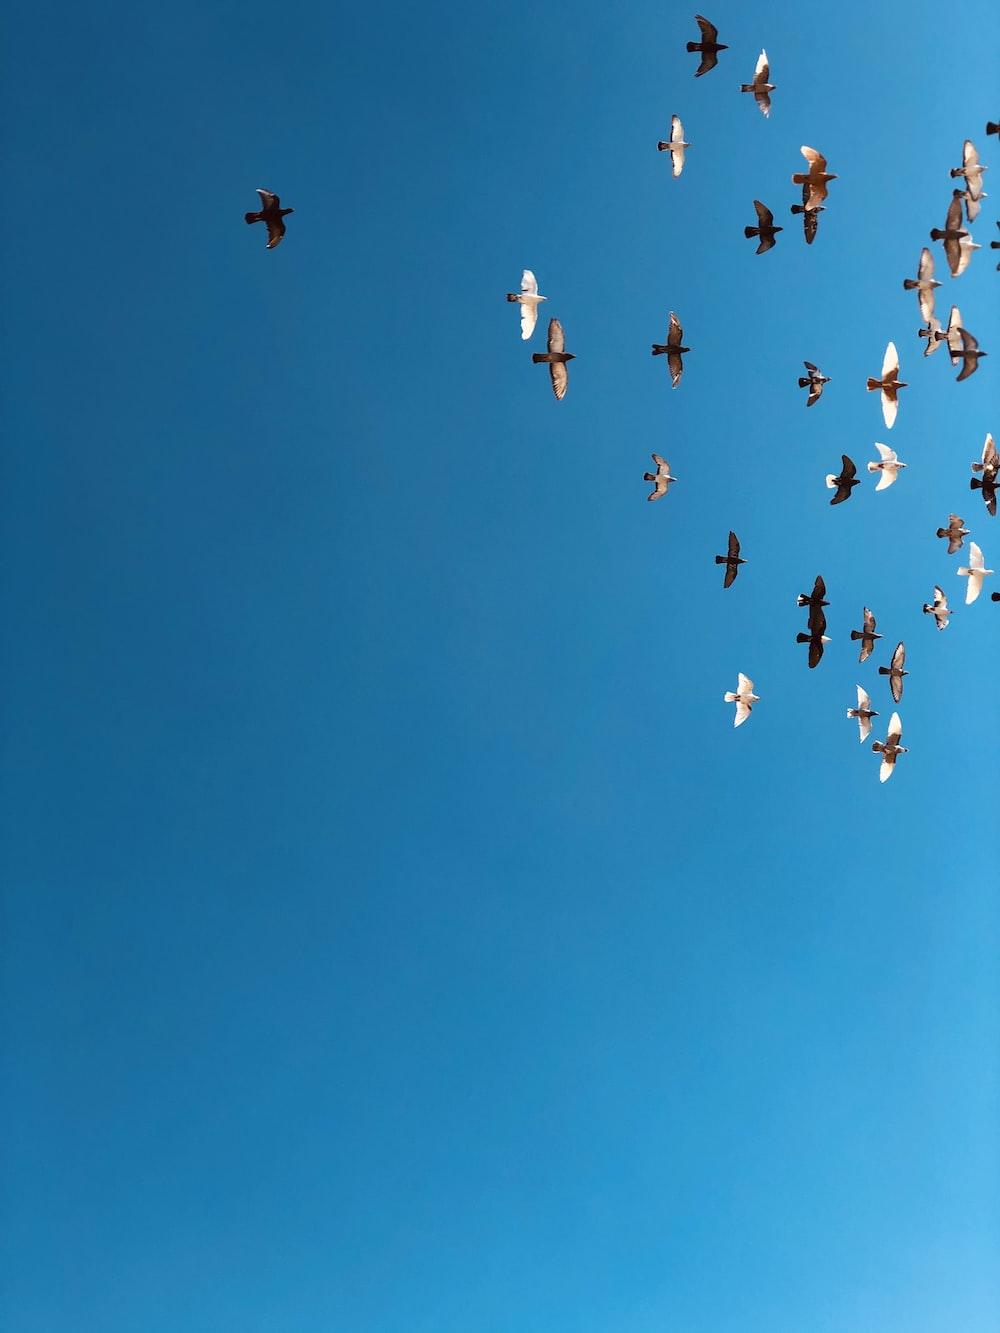 flock of bridges flying on blue sky